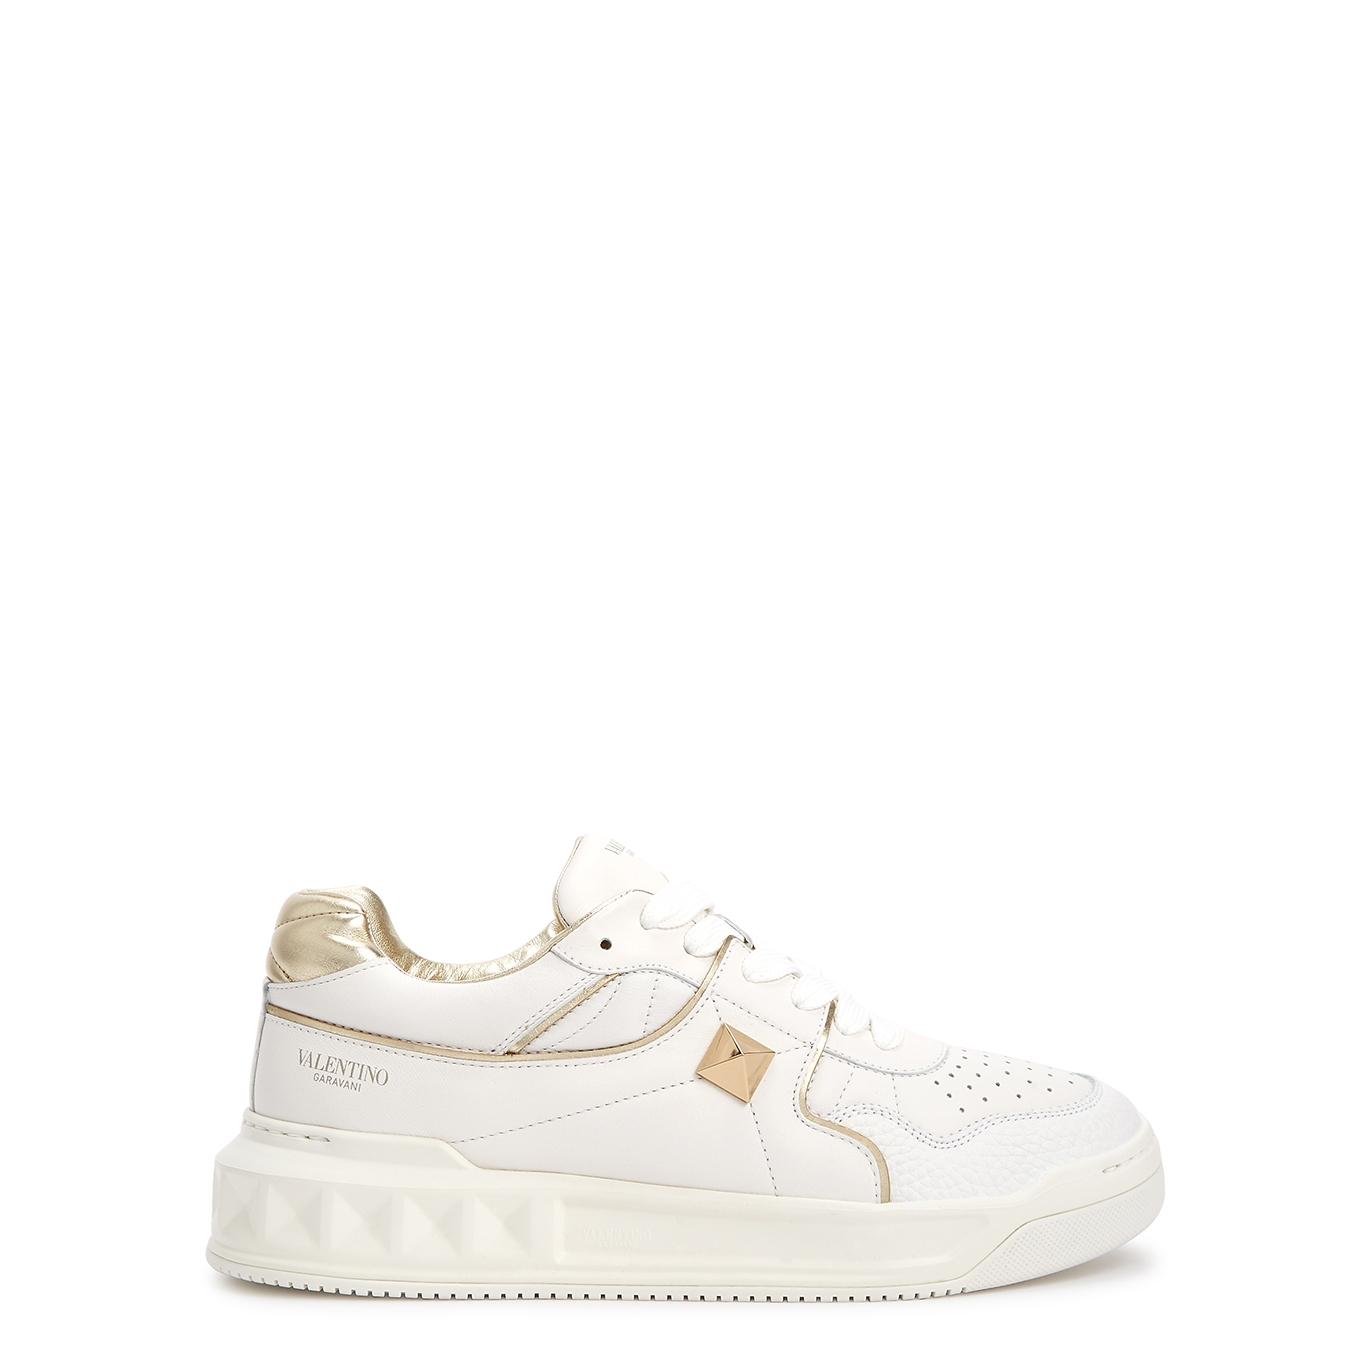 Valentino Garavani One Stud white leather sneakers